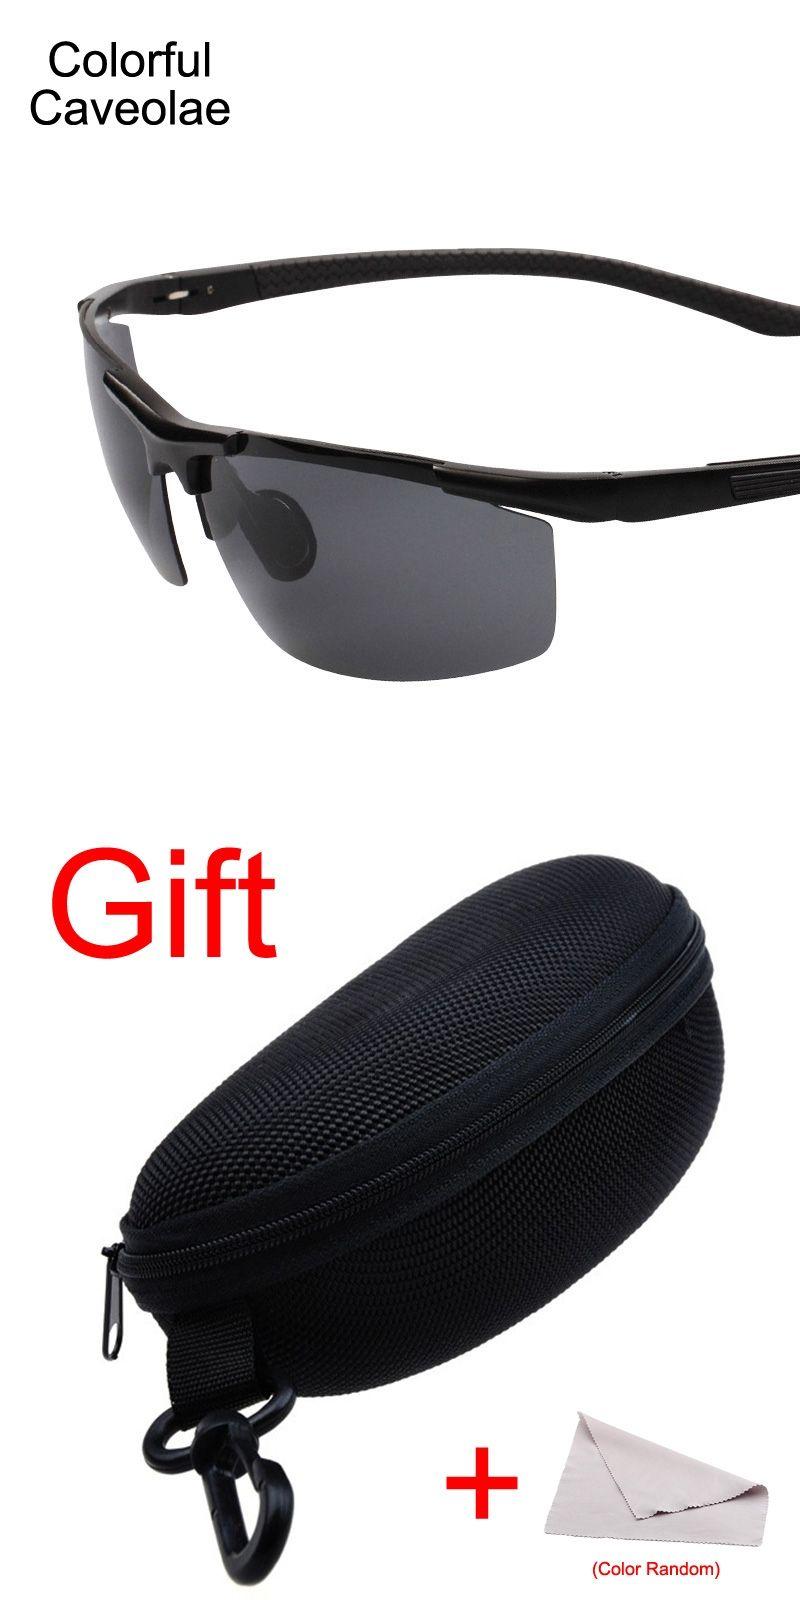 47809abc5990 Colorful Caveolae Sunglasses Polarized Men Popular Fashion Man Dark Glasses  Driving Gold Frame Male Brand Sun